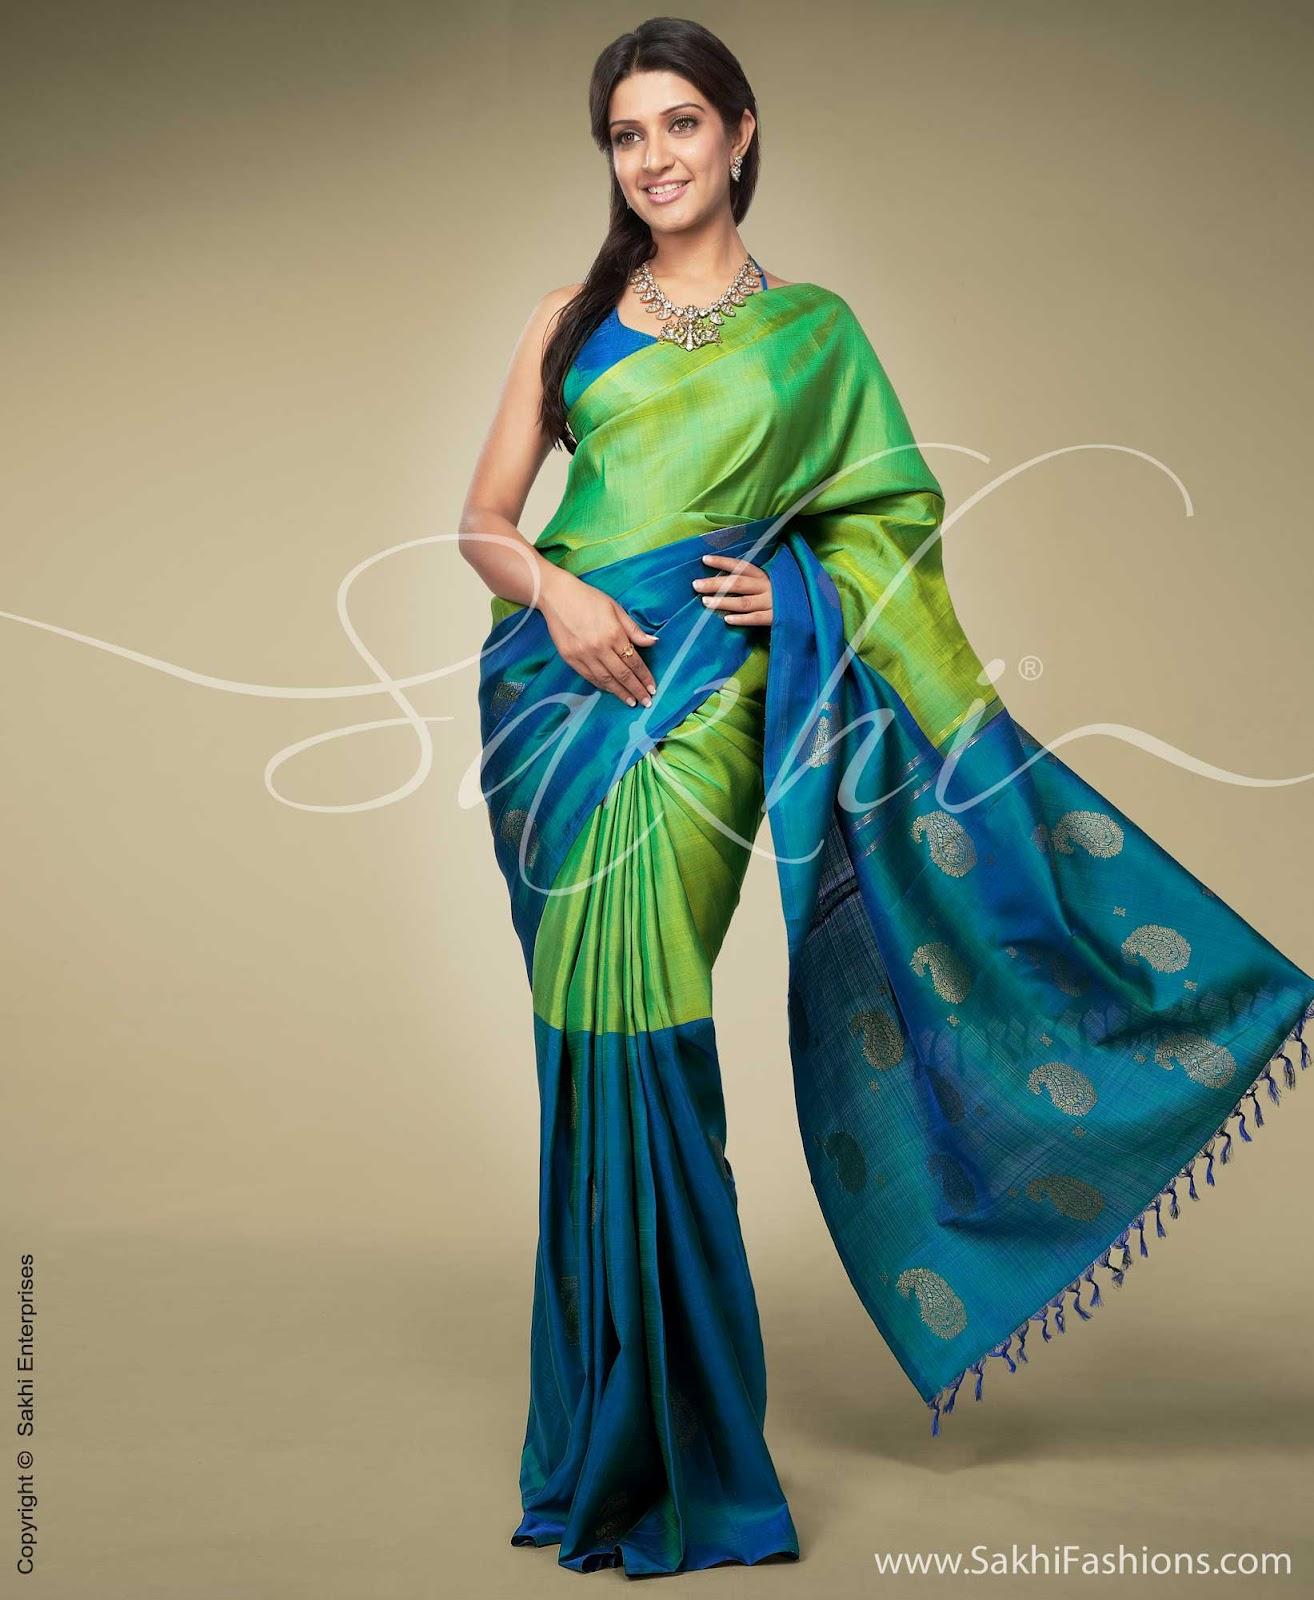 Indian Jewellery And Clothing Stunning Rich Kanchivaram